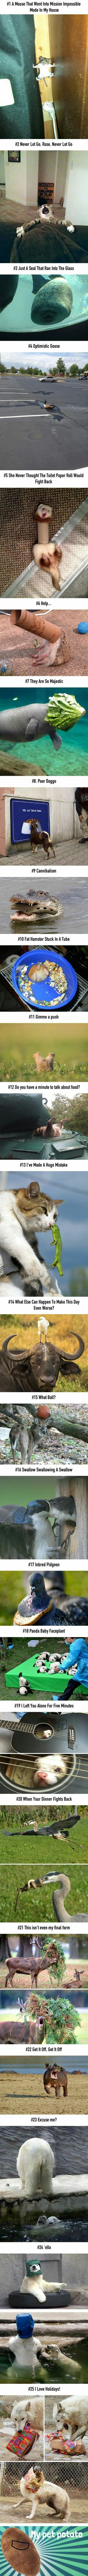 Animals got to love them lol - Imgur